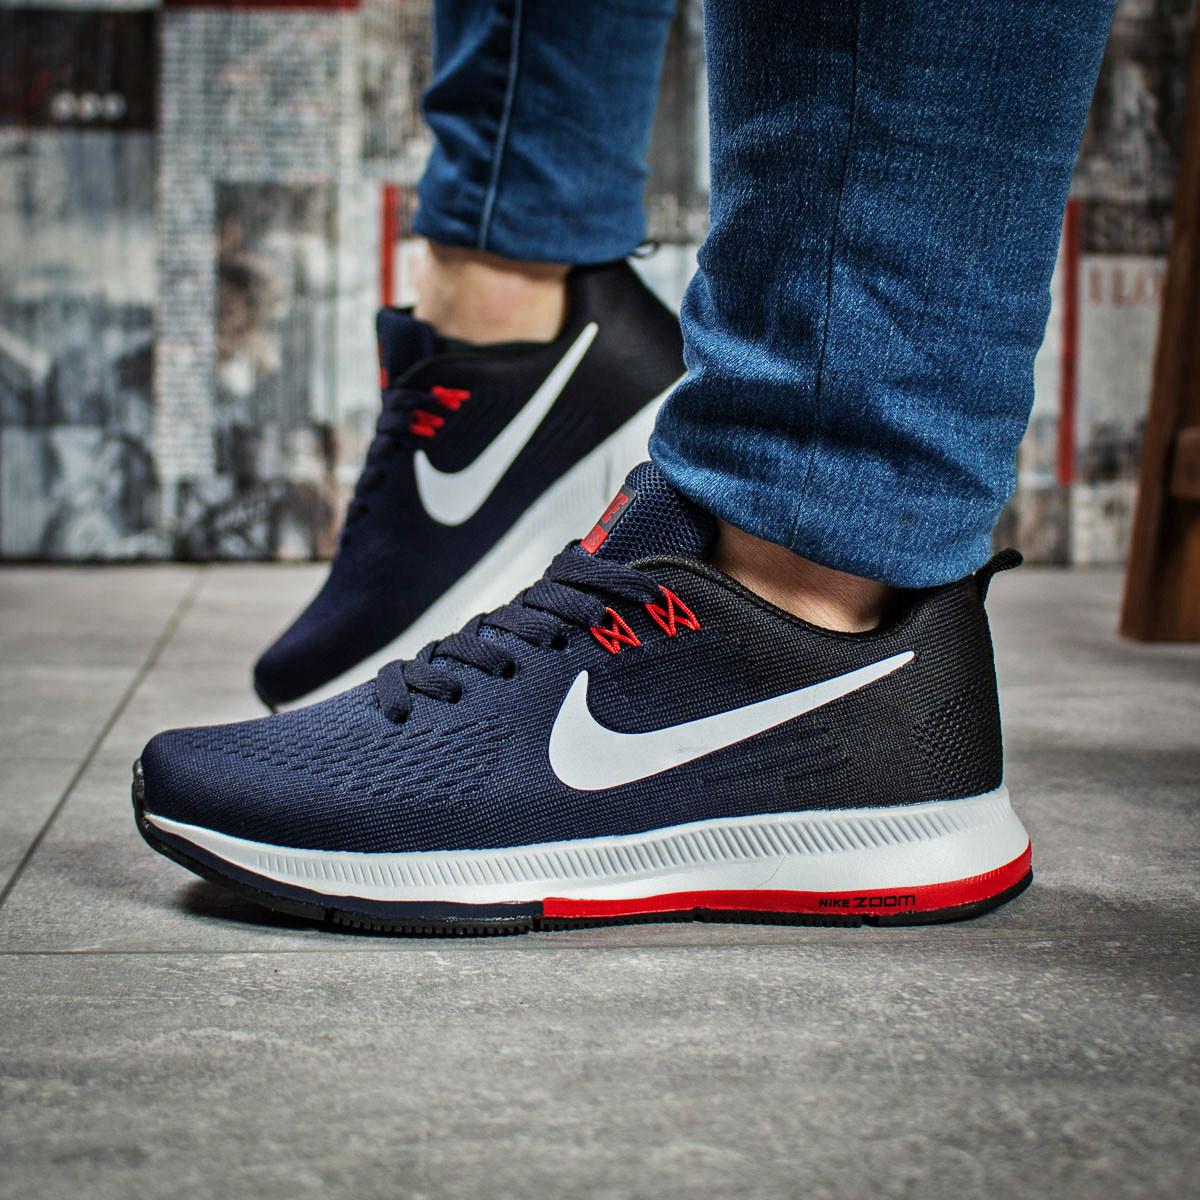 Кроссовки женские 16033, Nike Zoom Pegasus, темно-синие, [ 39 ] р. 39-24,5см.